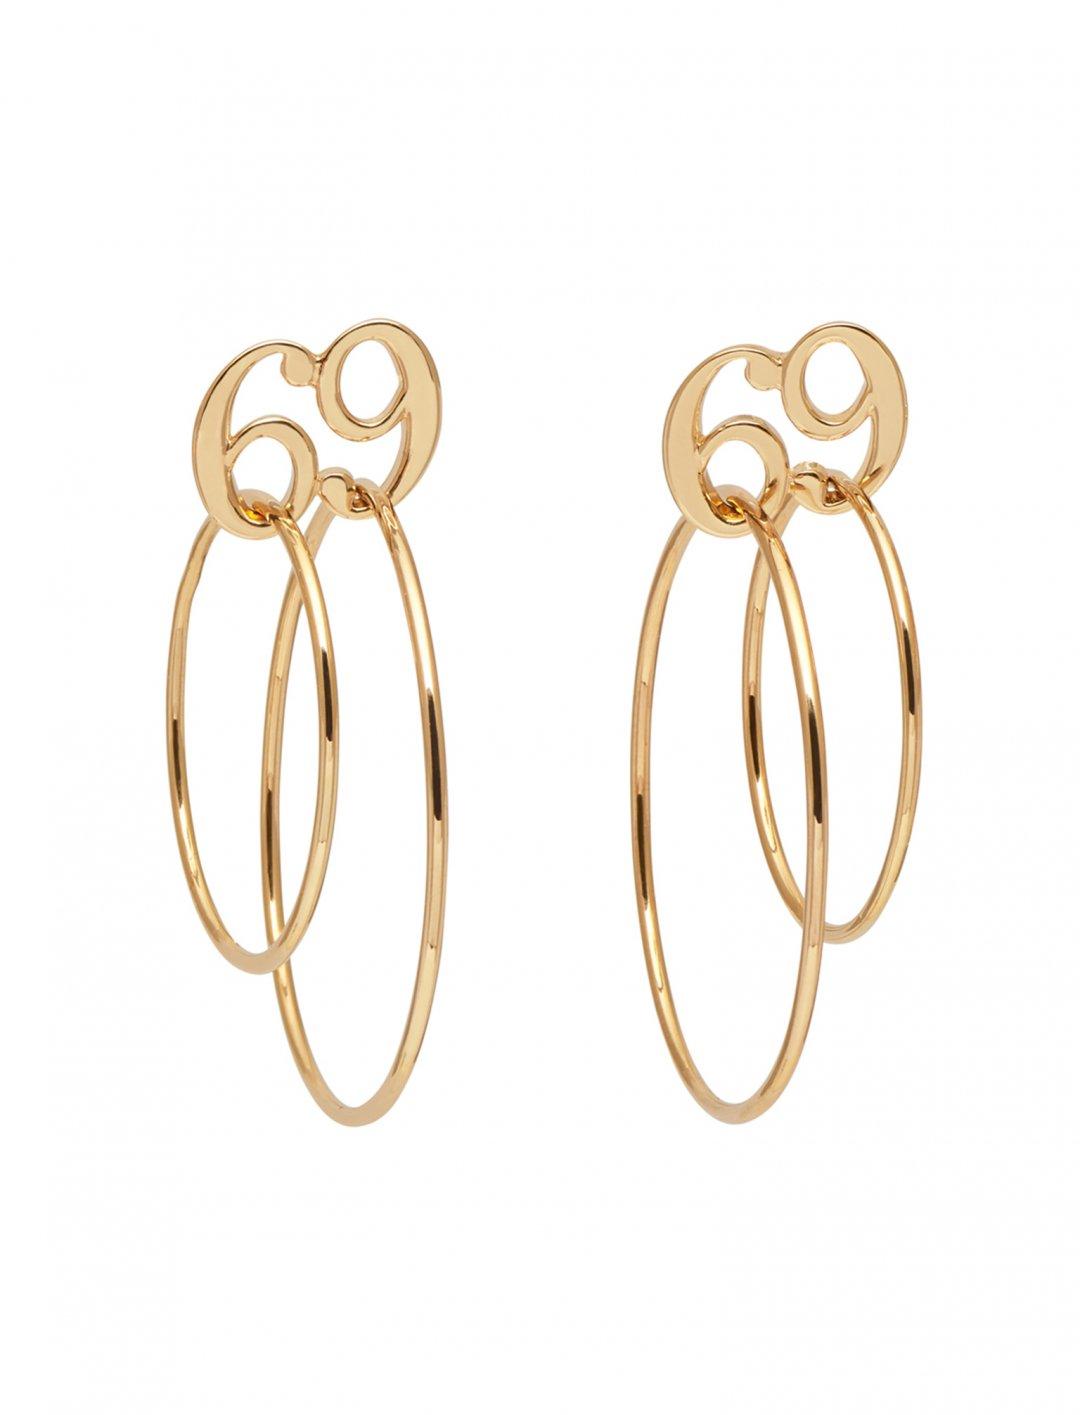 "Imani's 69 Double Circle Earrings {""id"":10,""product_section_id"":1,""name"":""Jewellery"",""order"":10} Jiwinaia"